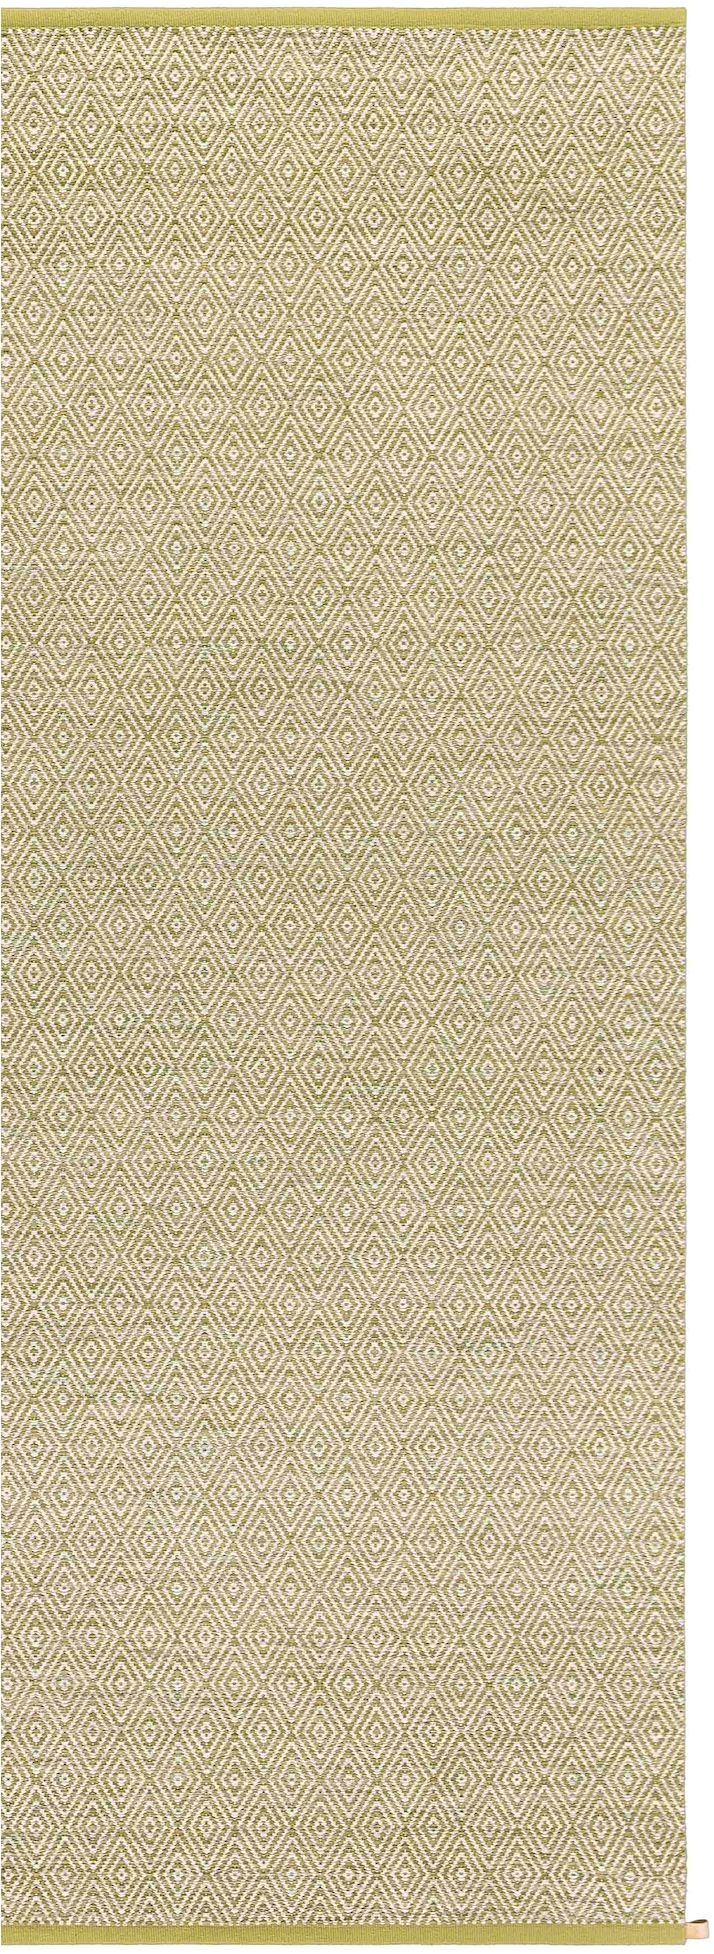 goose eye xl wool rug color straw size 2 9 x 7